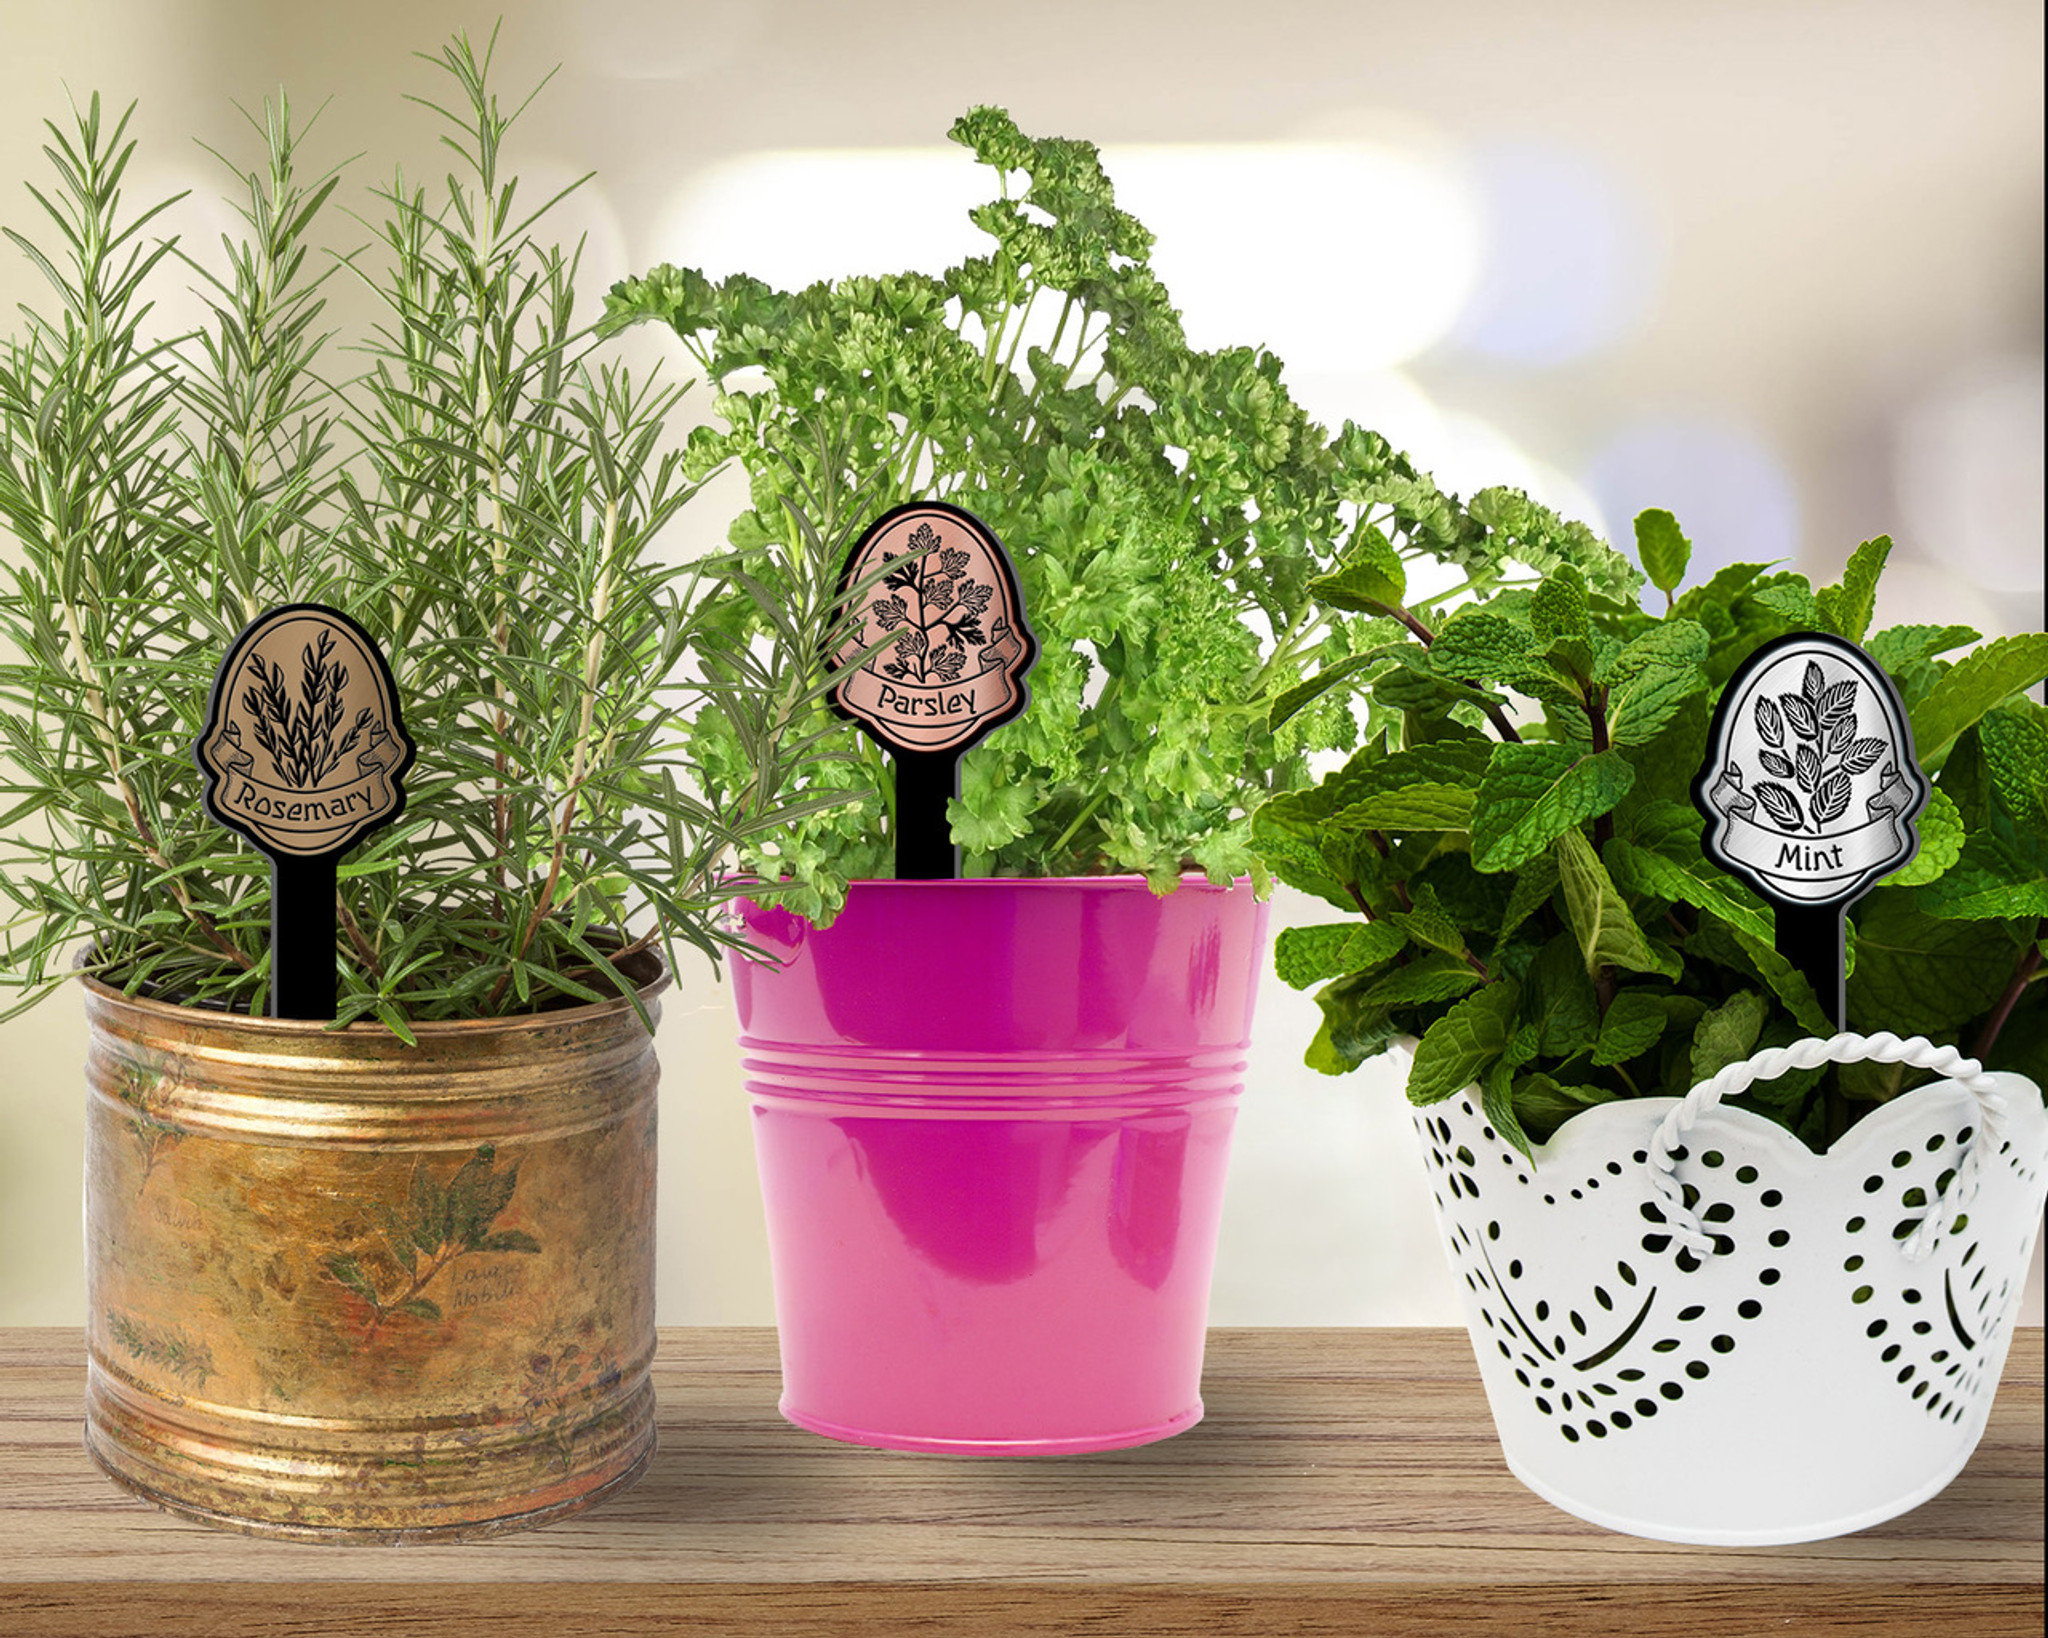 Ribbon Banner Flexibrass & Acrylic Herb Garden Stake